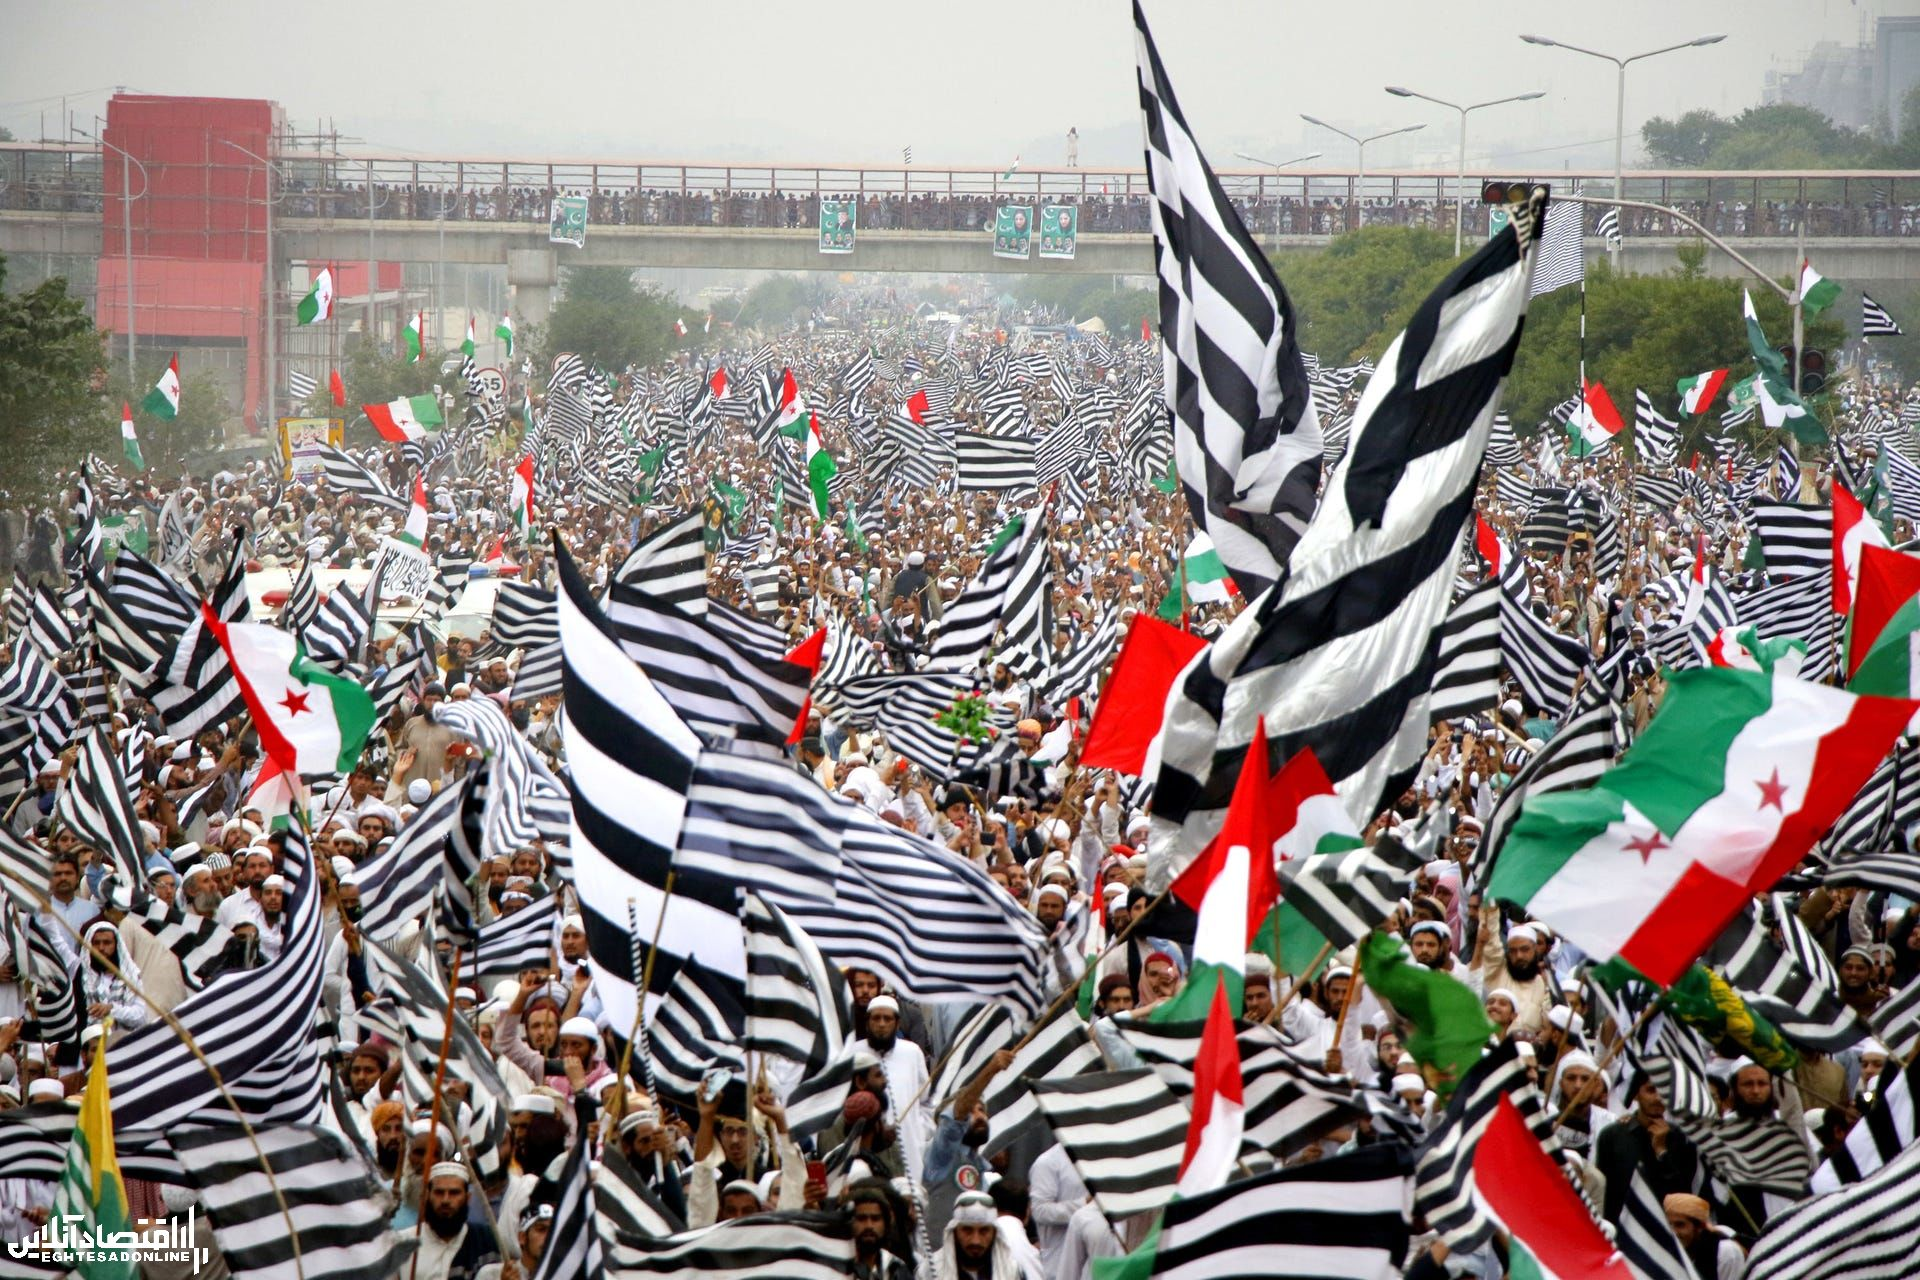 برترین تصاویر خبری ۲۴ ساعت گذشته/ 11 آبان